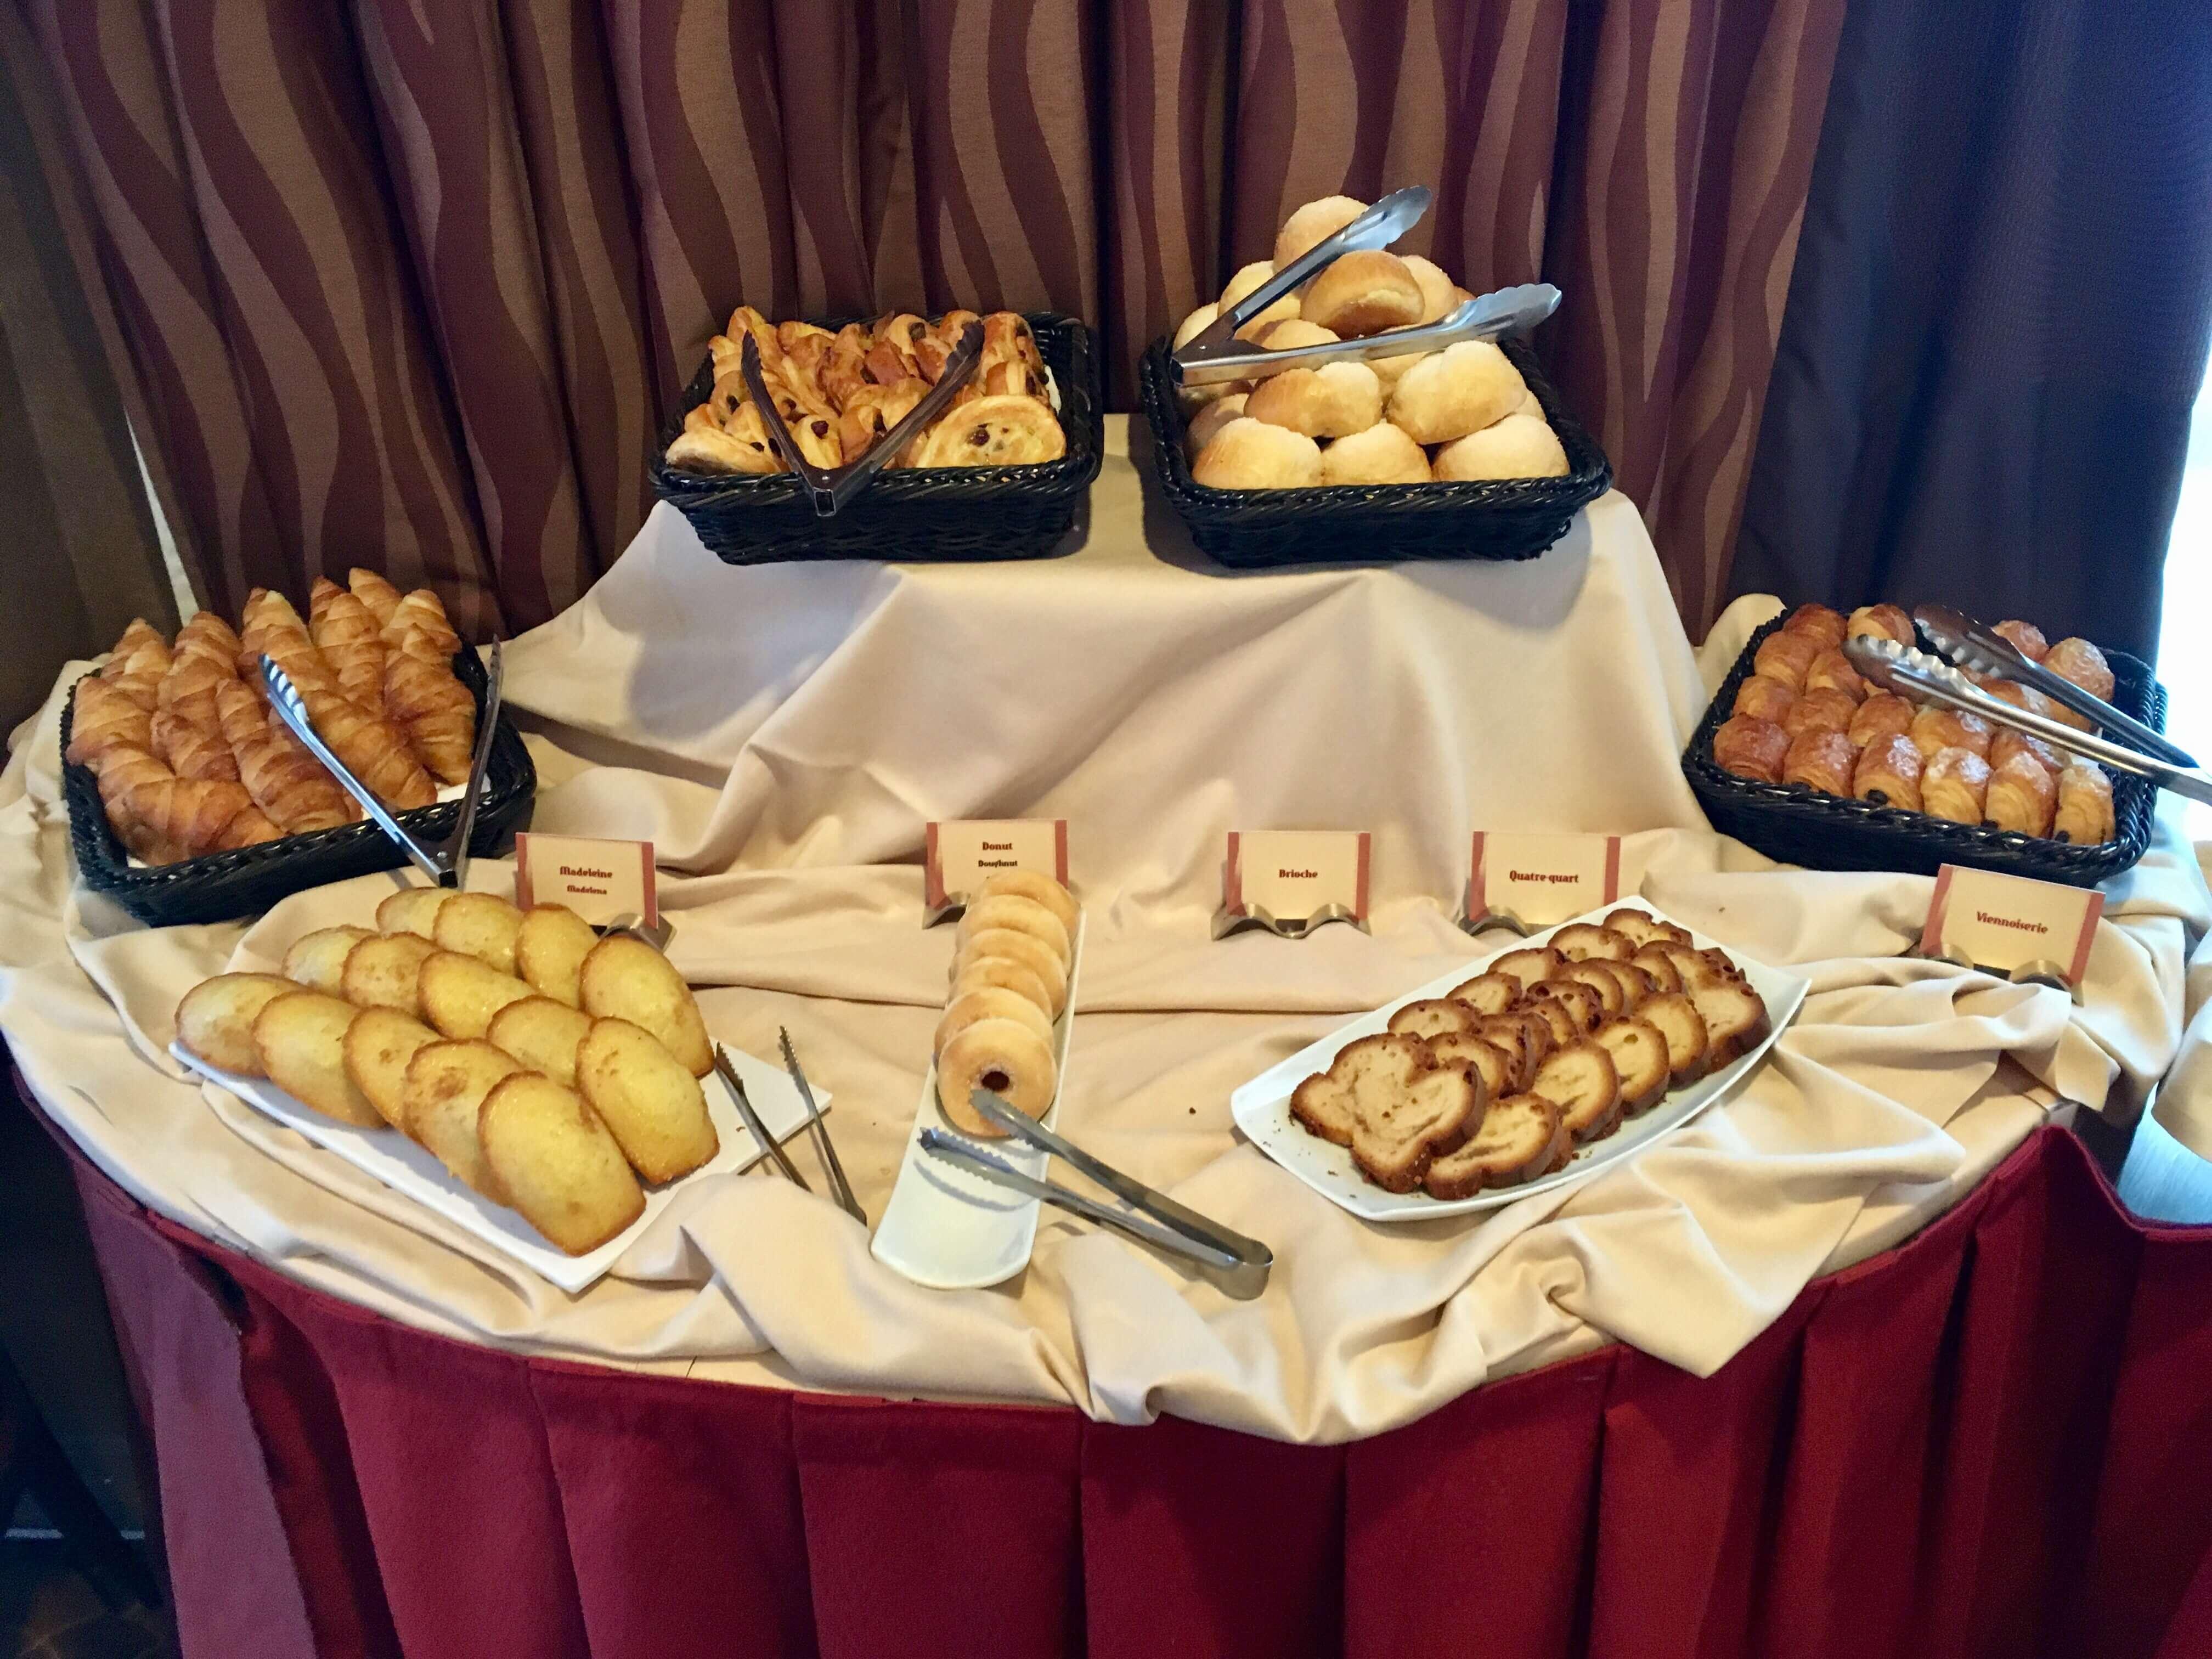 Kuchenauswahl Frühstück